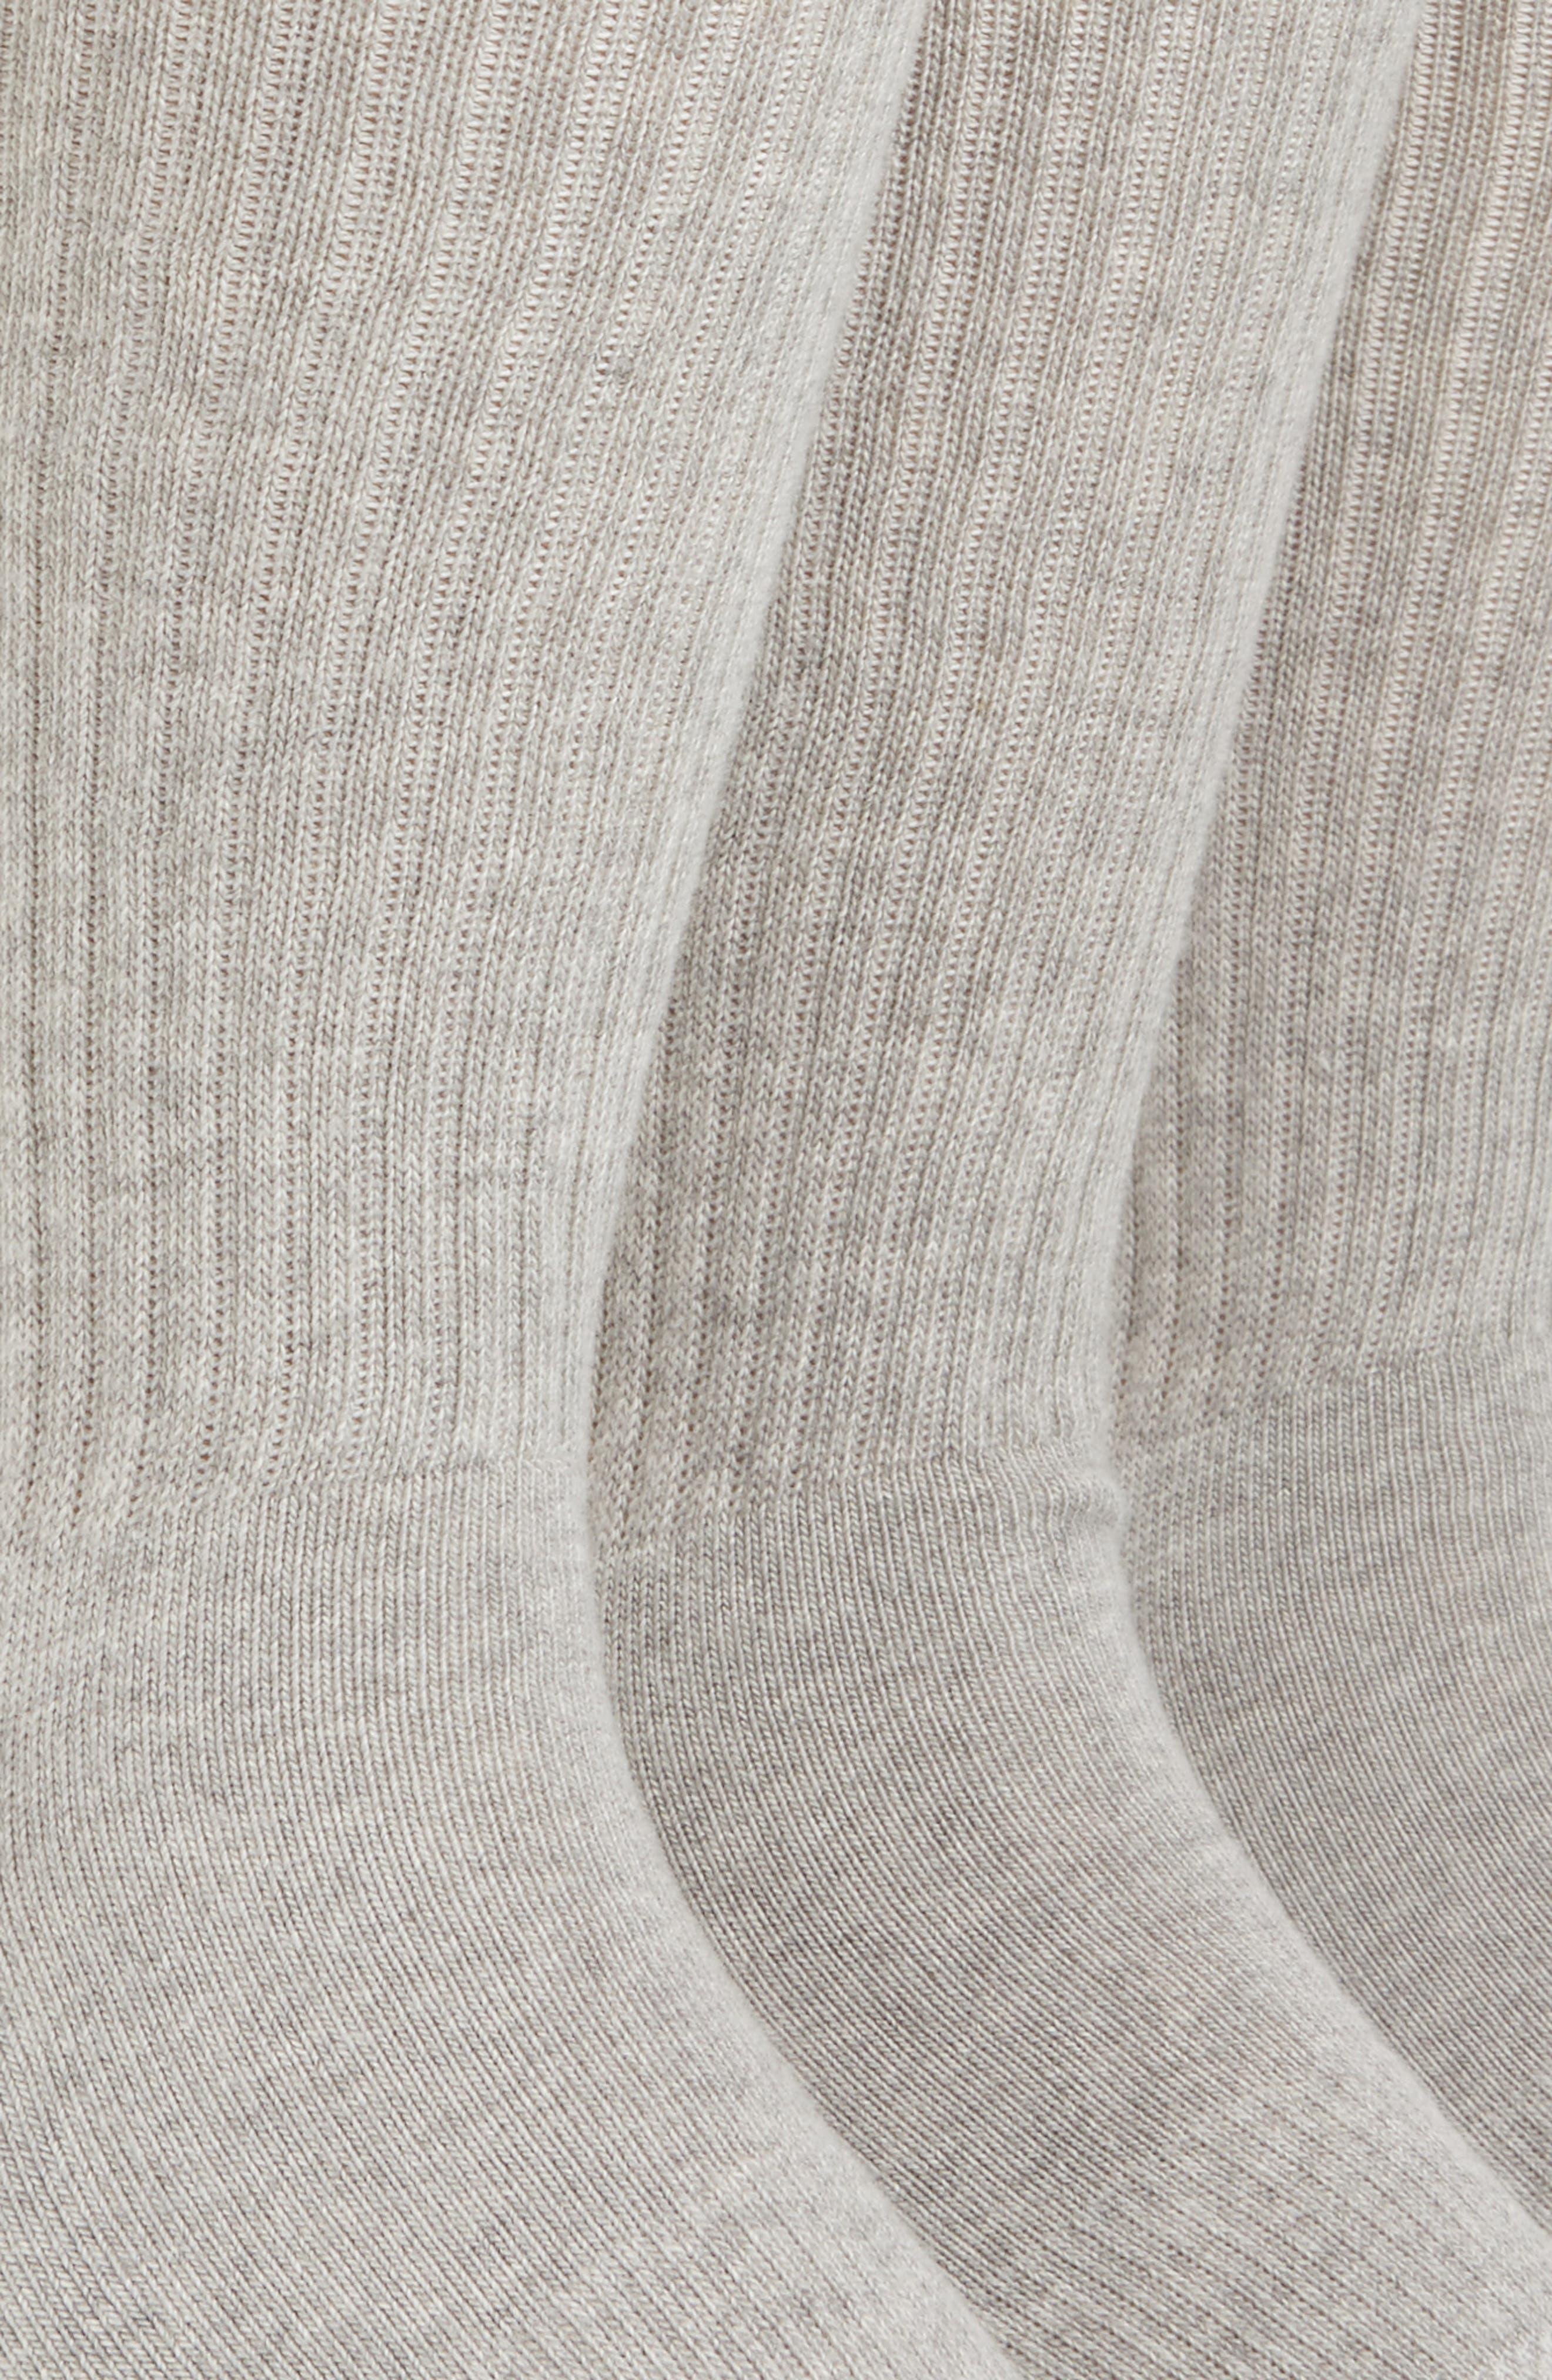 Alternate Image 2  - Nordstrom Men's Shop 3-Pack Crew Cut Athletic Socks (King Size)